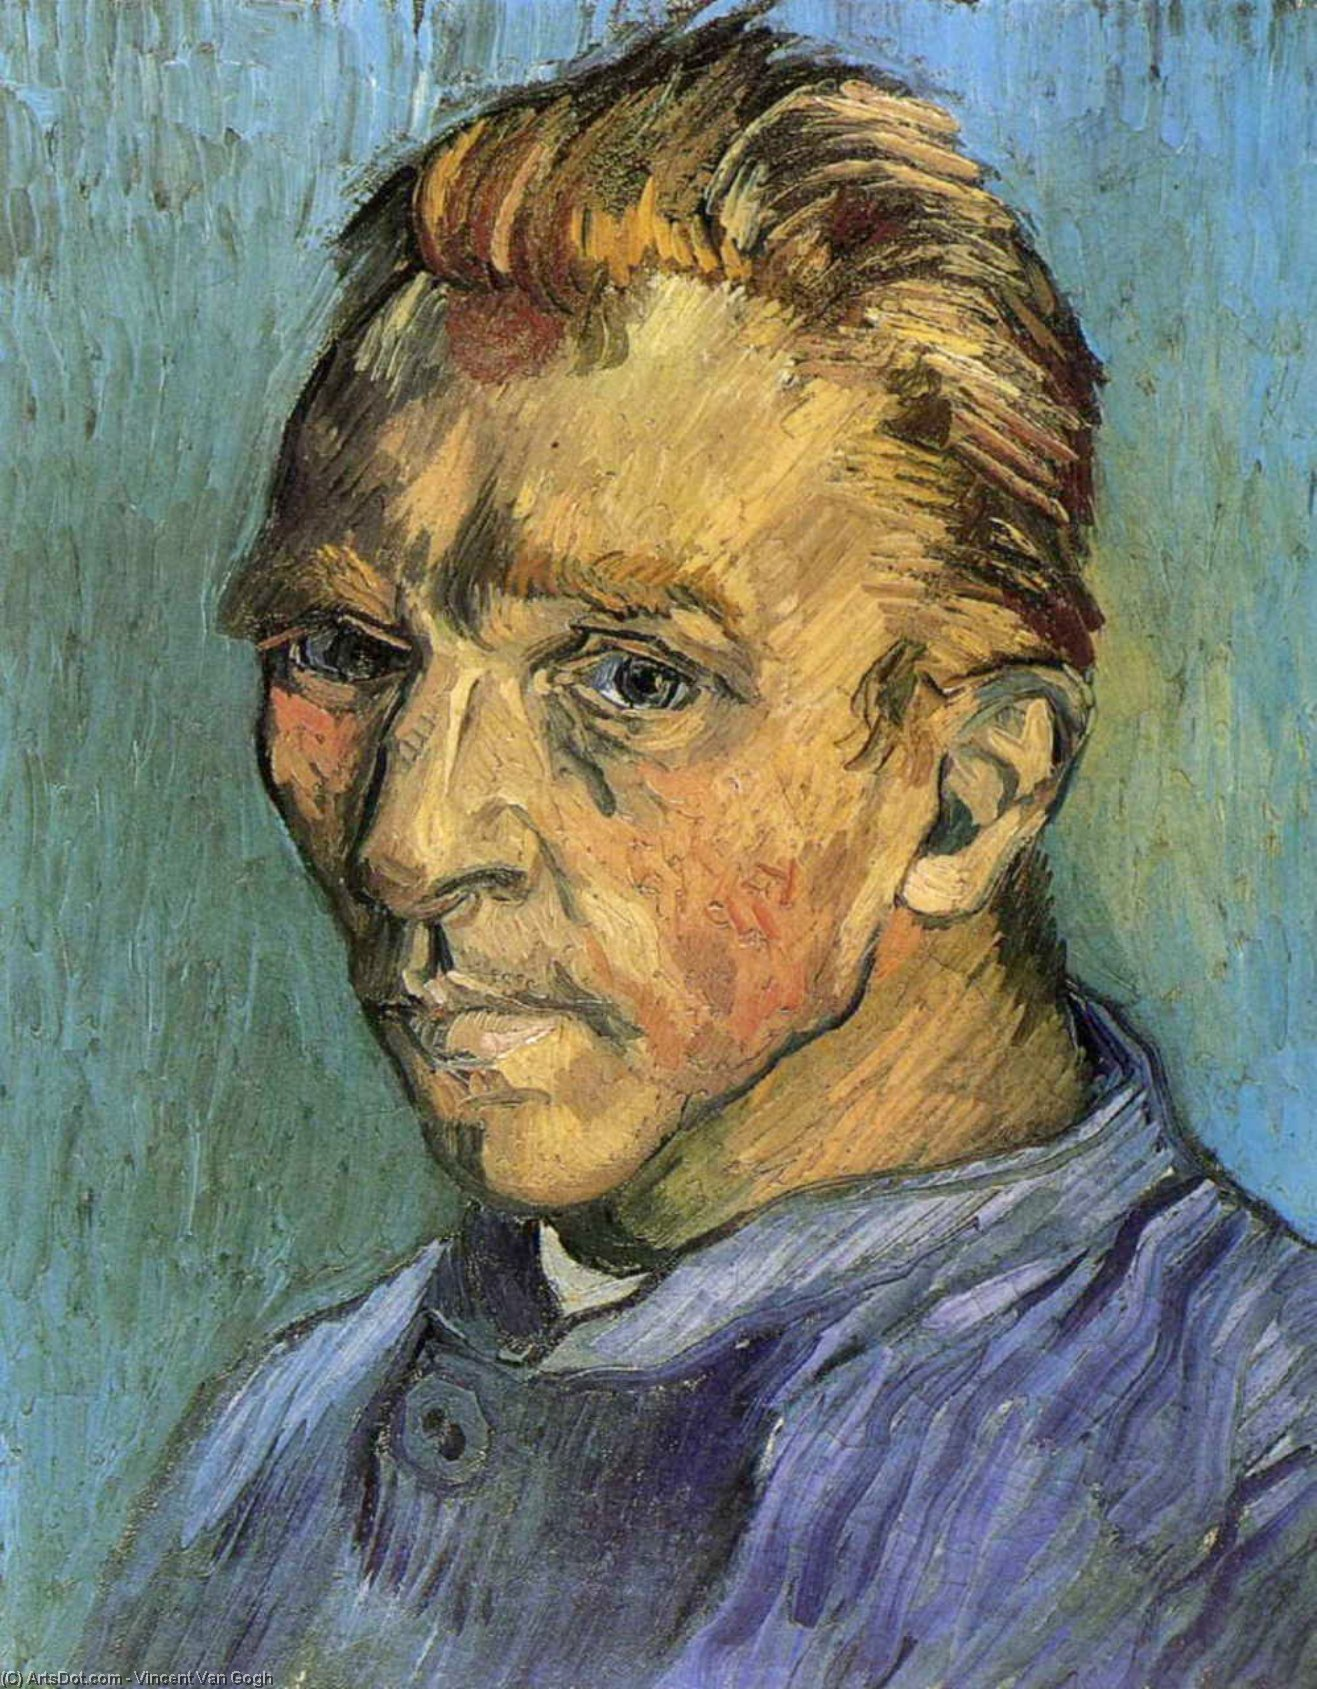 WikiOO.org - Enciklopedija dailės - Tapyba, meno kuriniai Vincent Van Gogh - Self Portrait